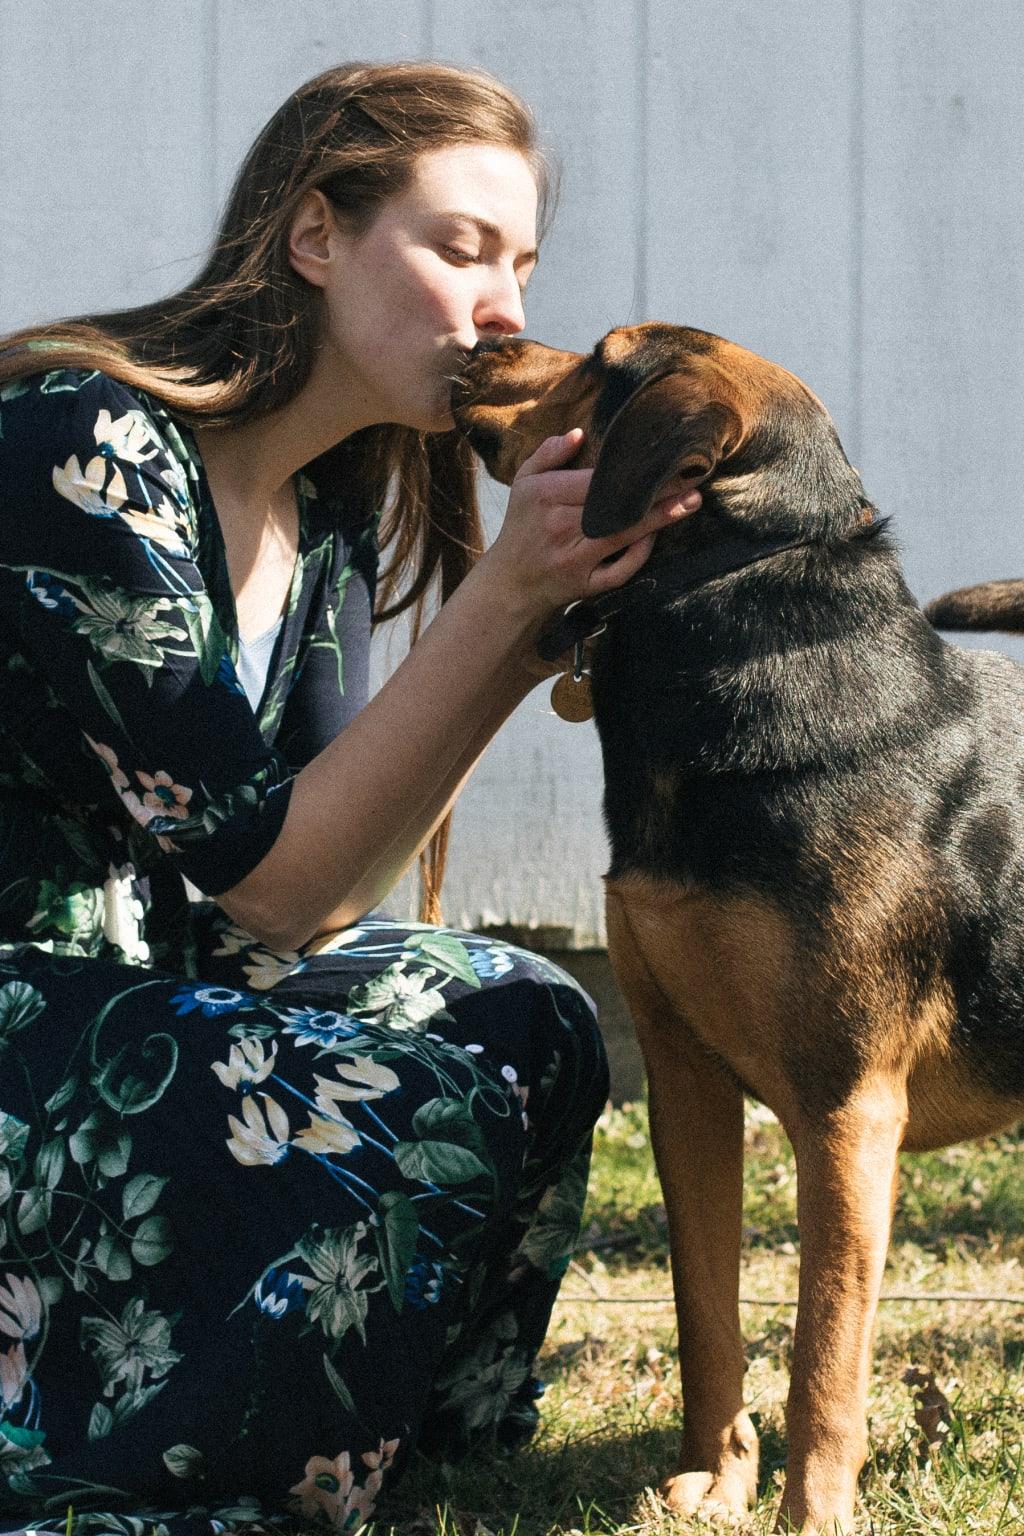 How a Craigslist Puppy Changed My World